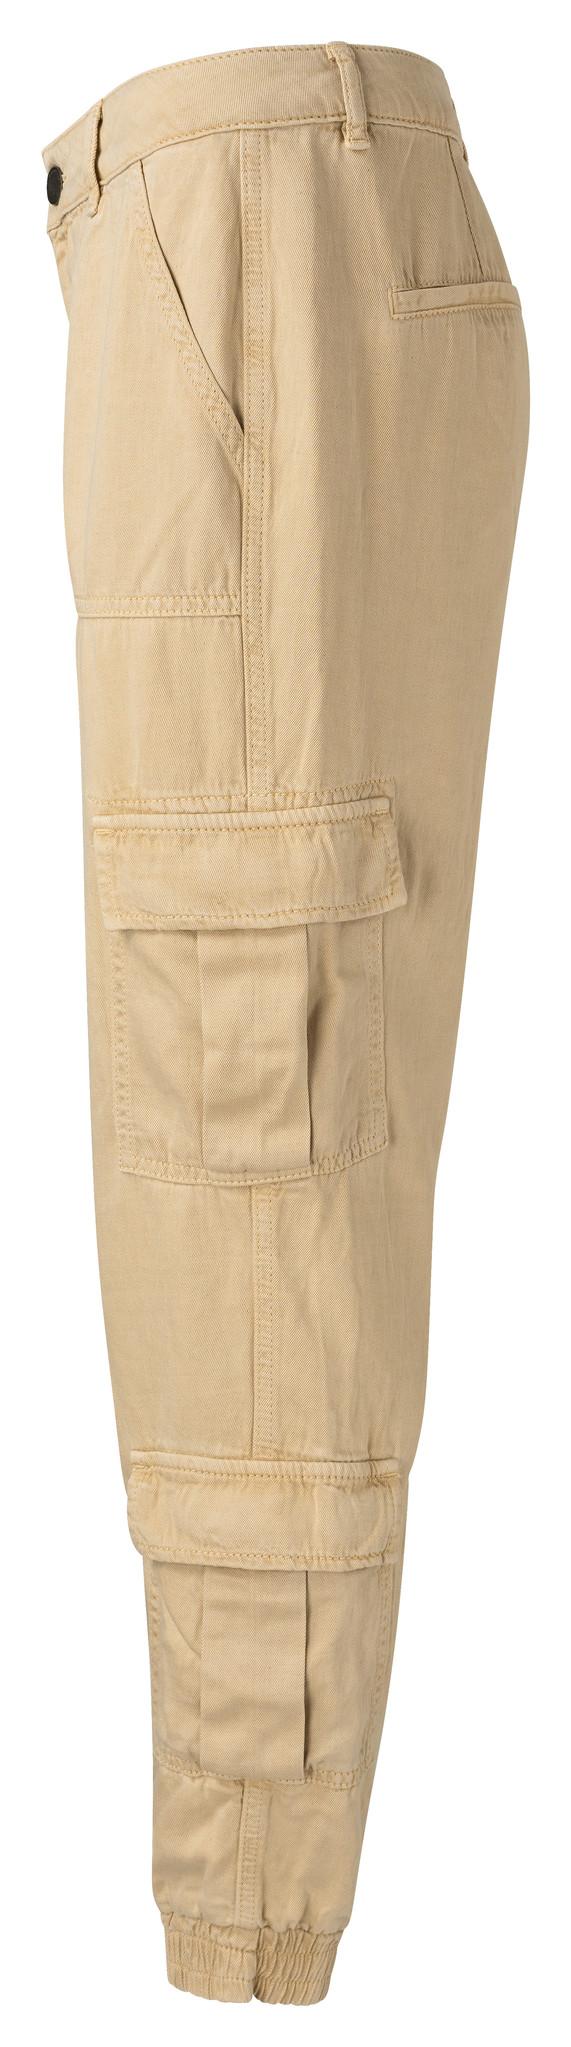 yaya Cargo trousers with 1201147-115-2